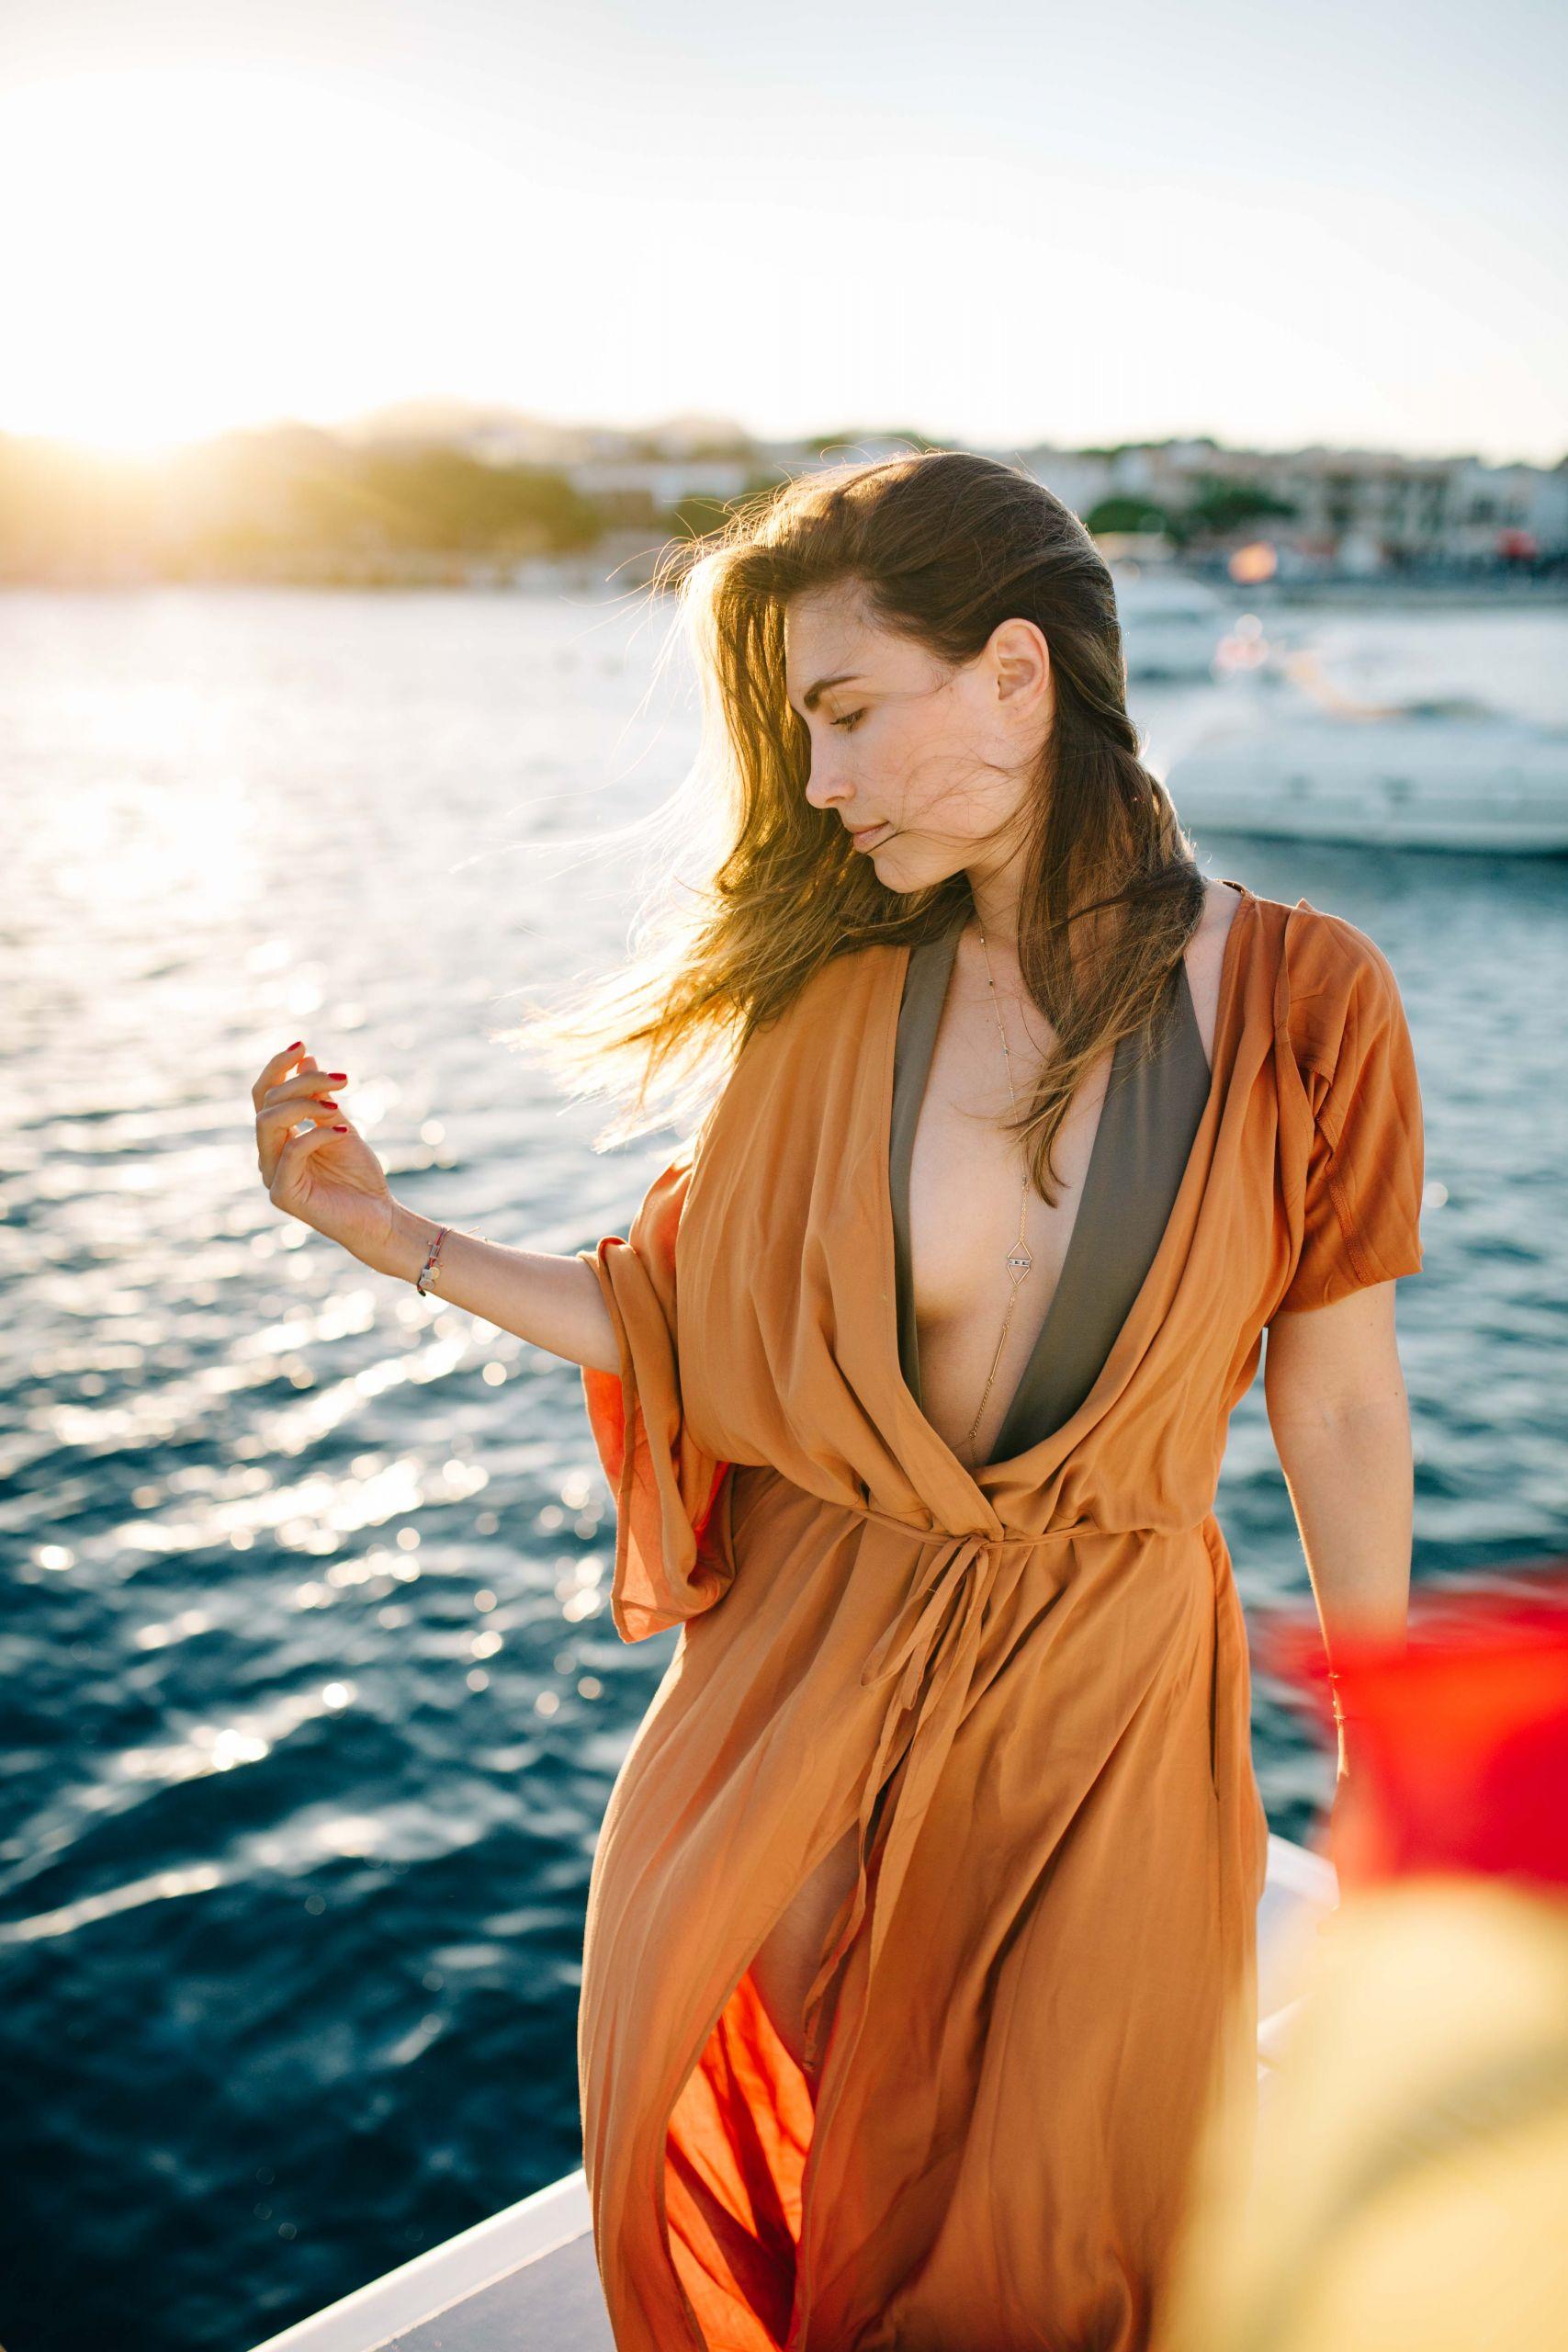 Bikini Season Is On: Favorite Swimwear Trends 2018   love daily dose